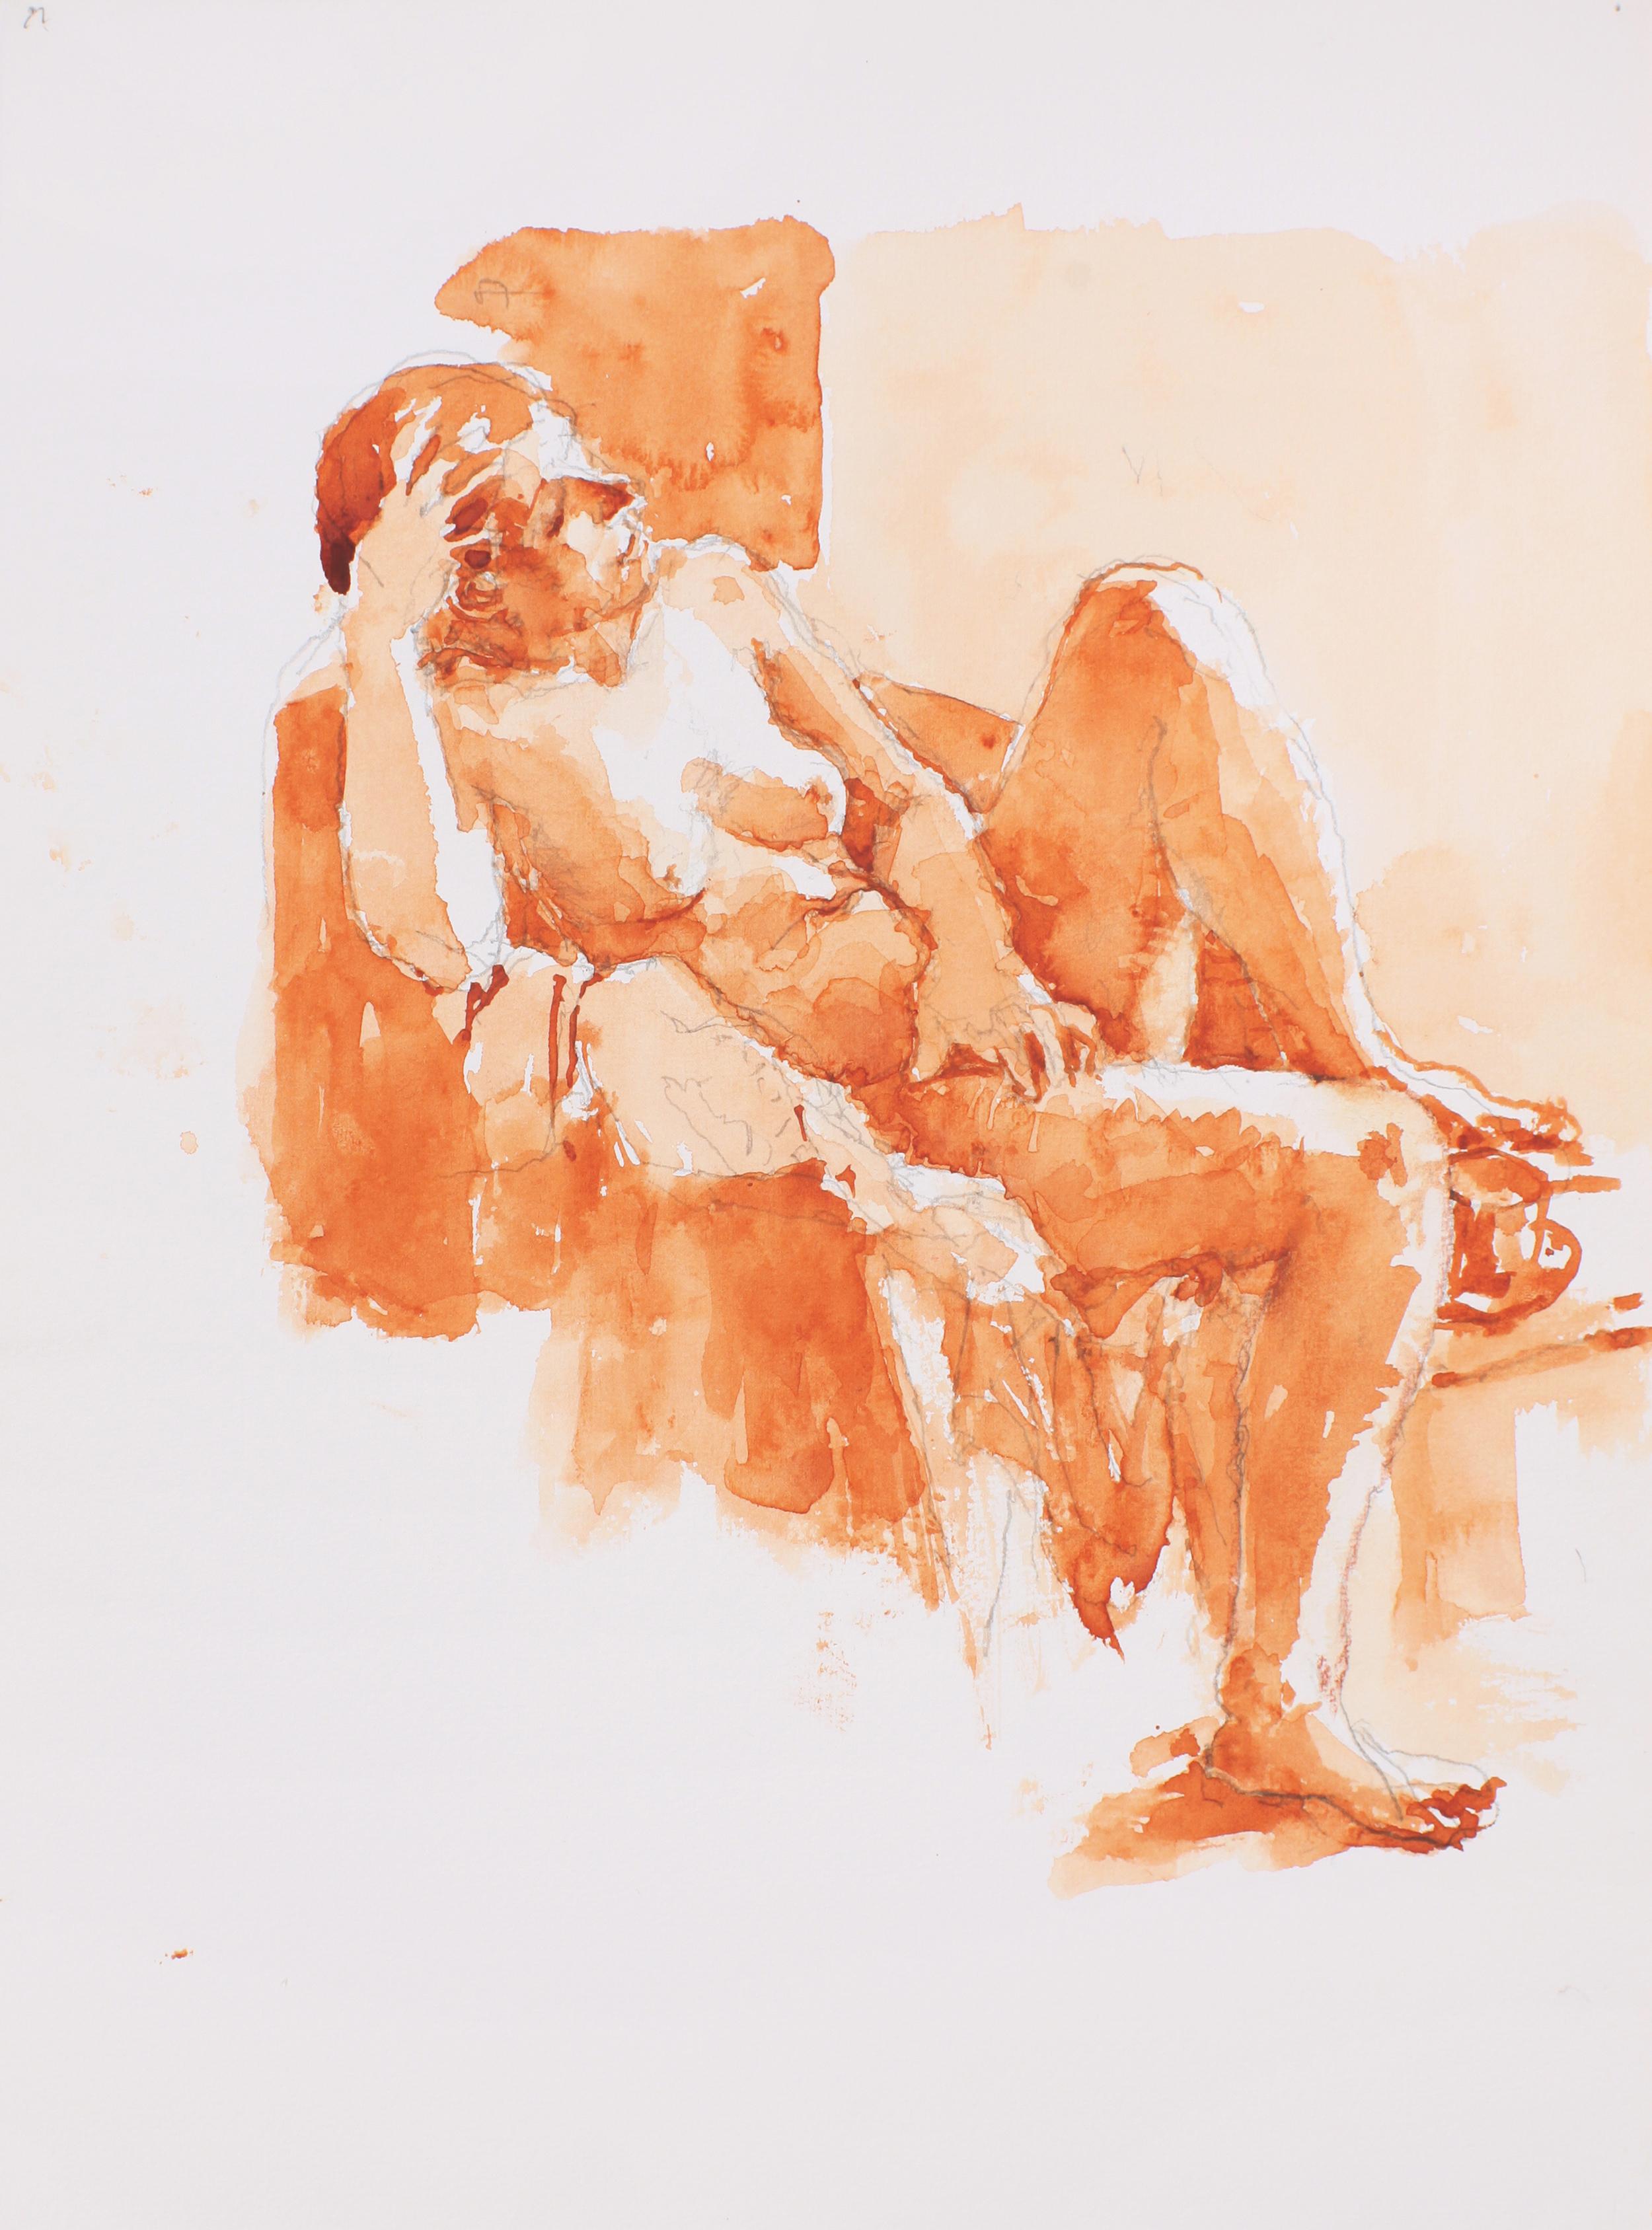 Seated Nude in Contraposto